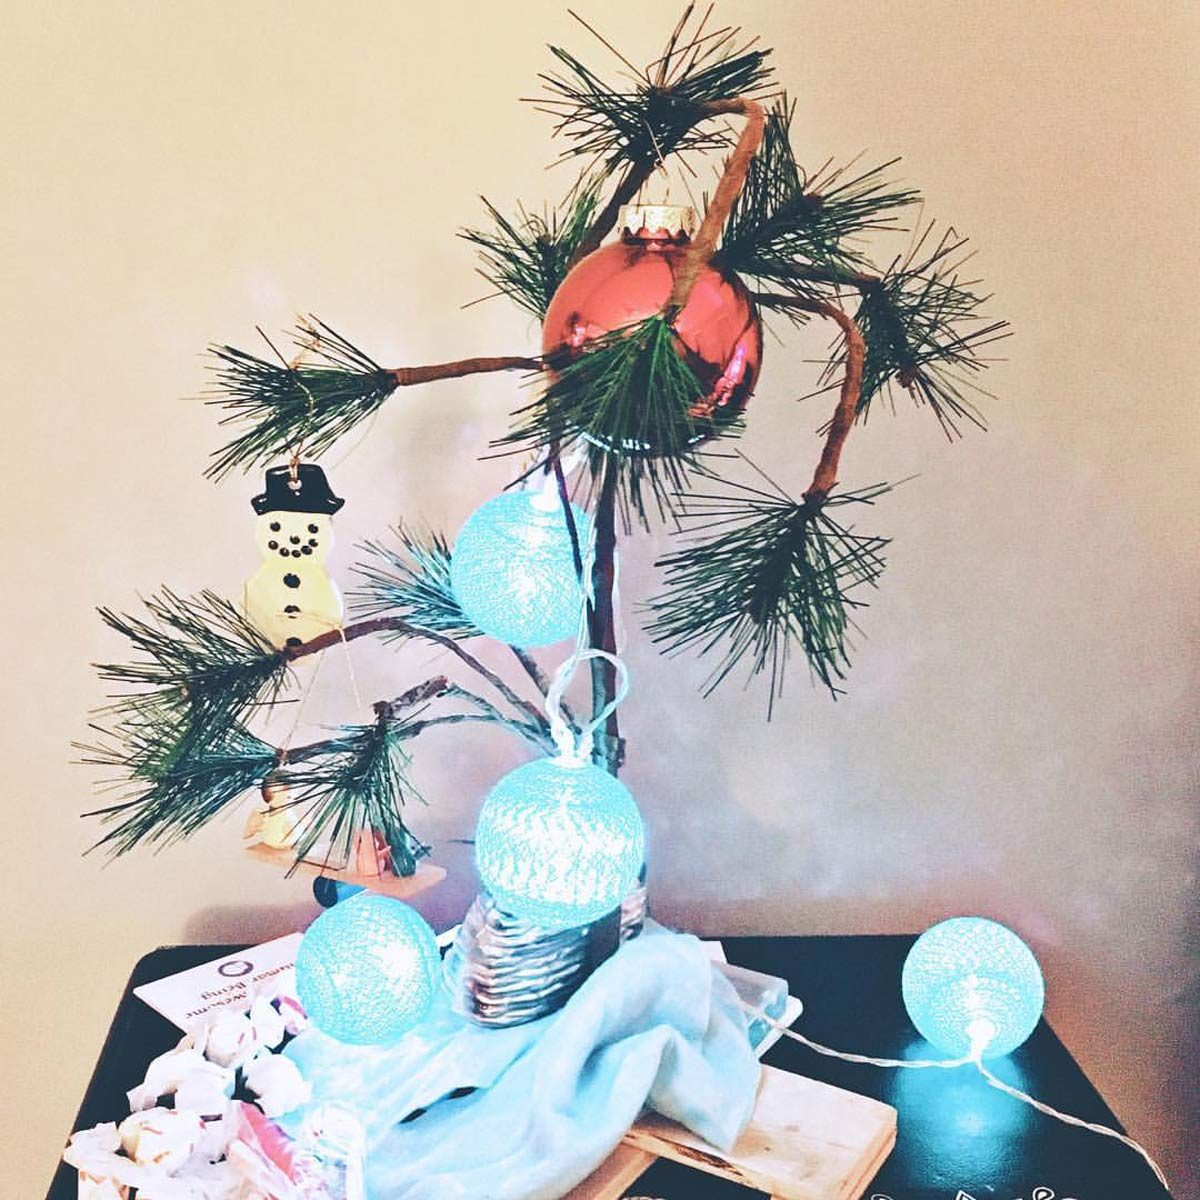 Outsized Ornaments